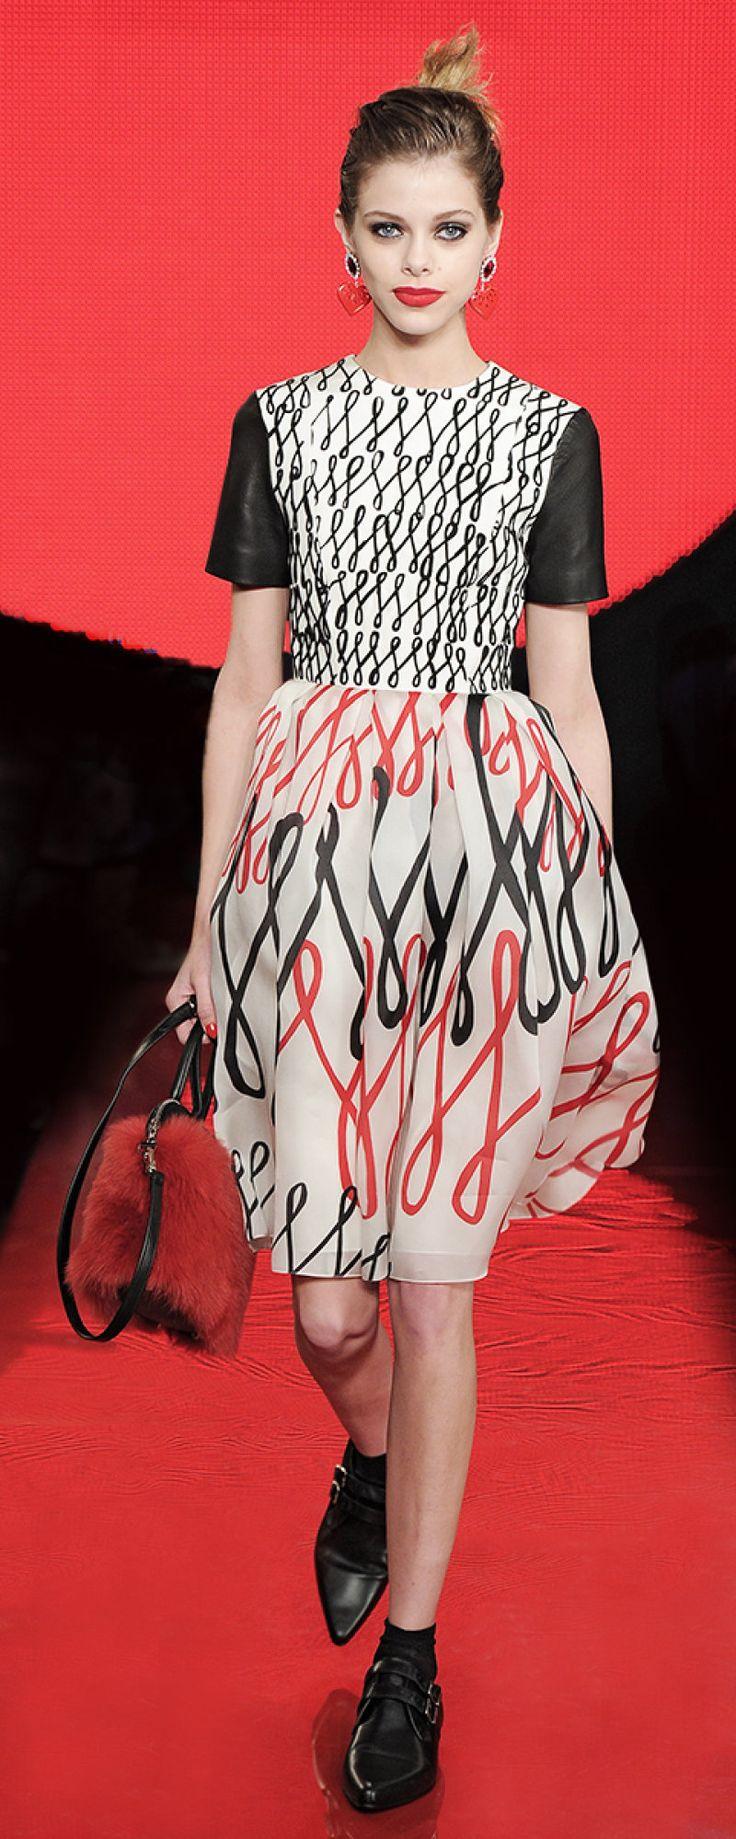 fashion and textiles dissertation